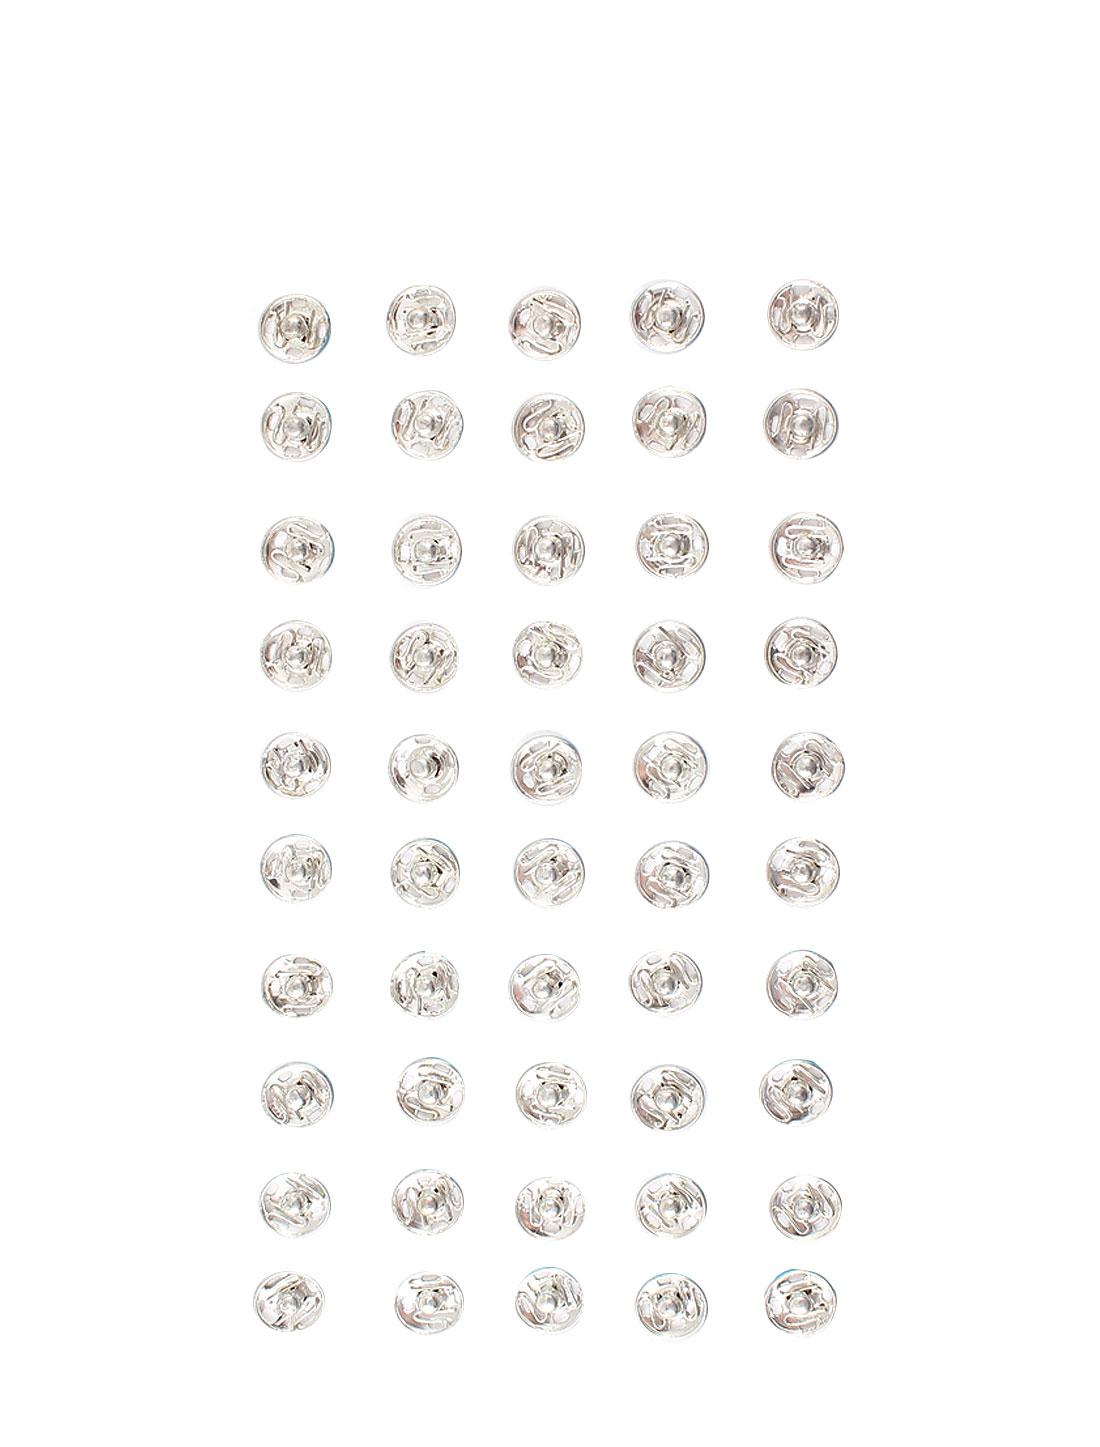 50 Pcs Silver Tone Metal Clothes Repair Snap Press Fastener Buttons